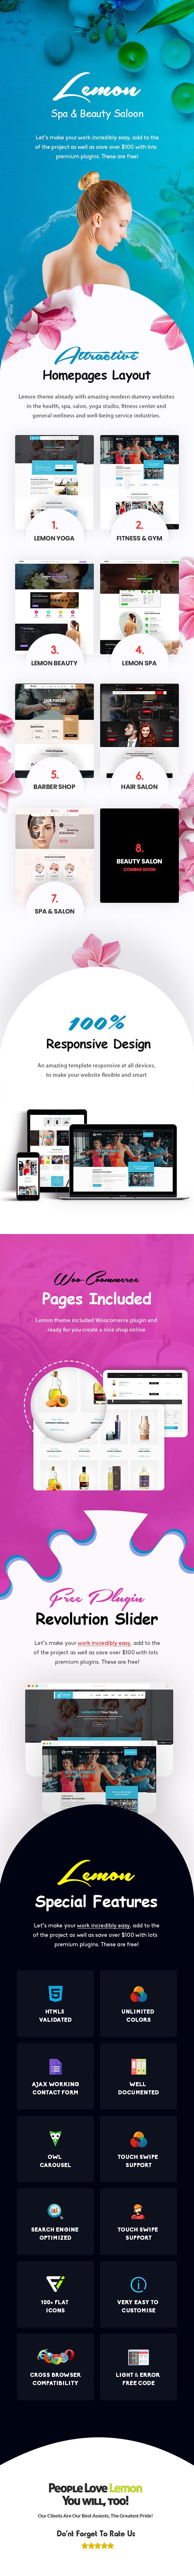 Lemon | Spa & Beauty Responsive Multi-Purpose WordPress Theme - 1